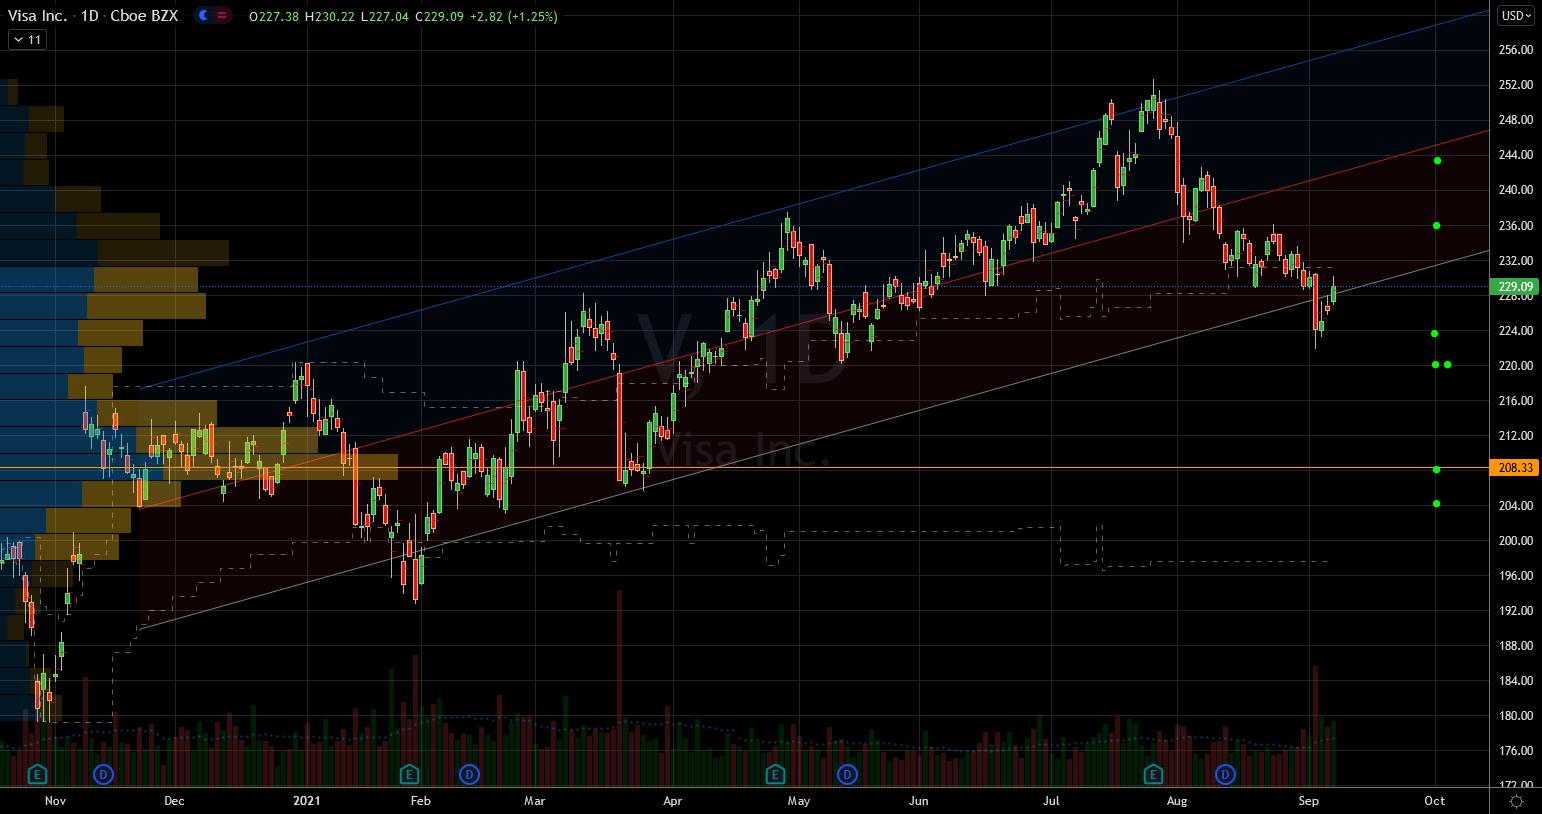 Fintech Stocks to Buy: Visa (V) Stock Chart Showing Potential Base